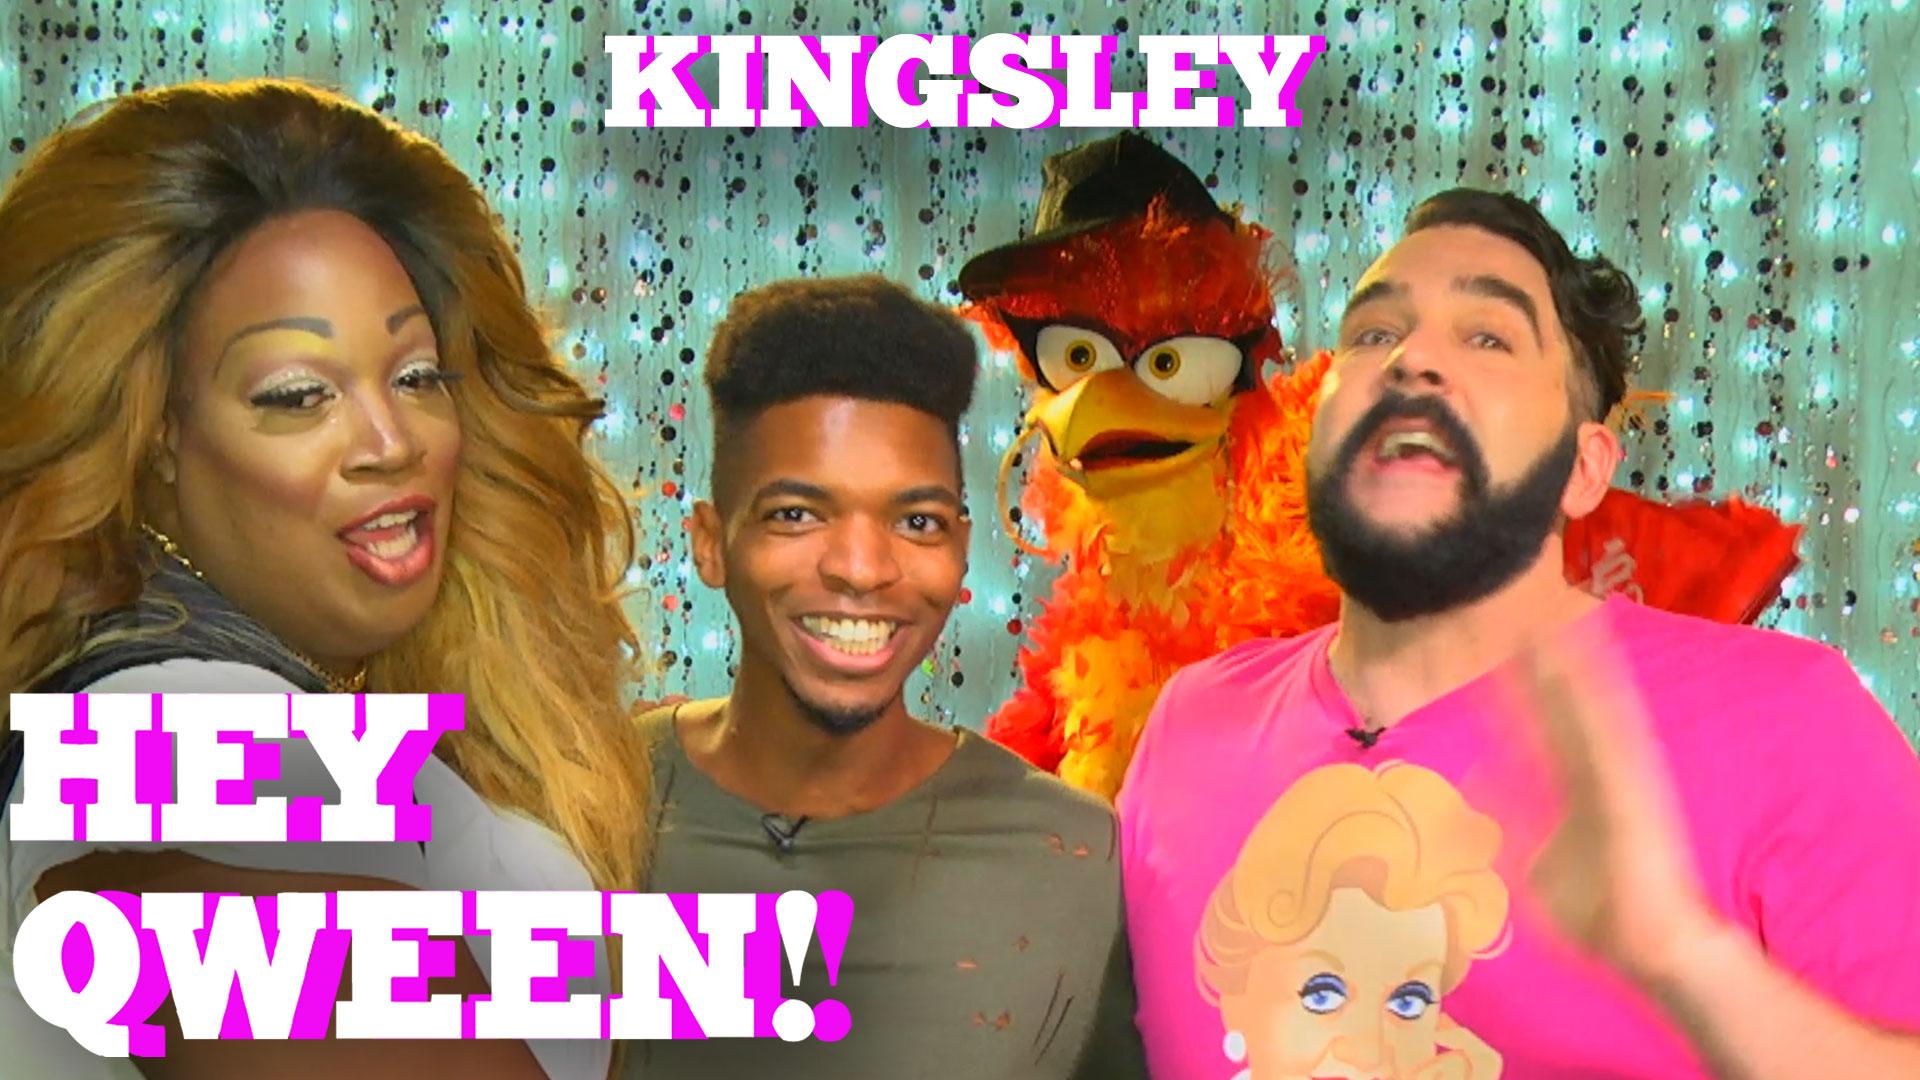 KINGSLEY on HEY QWEEN! with Jonny McGovern PROMO